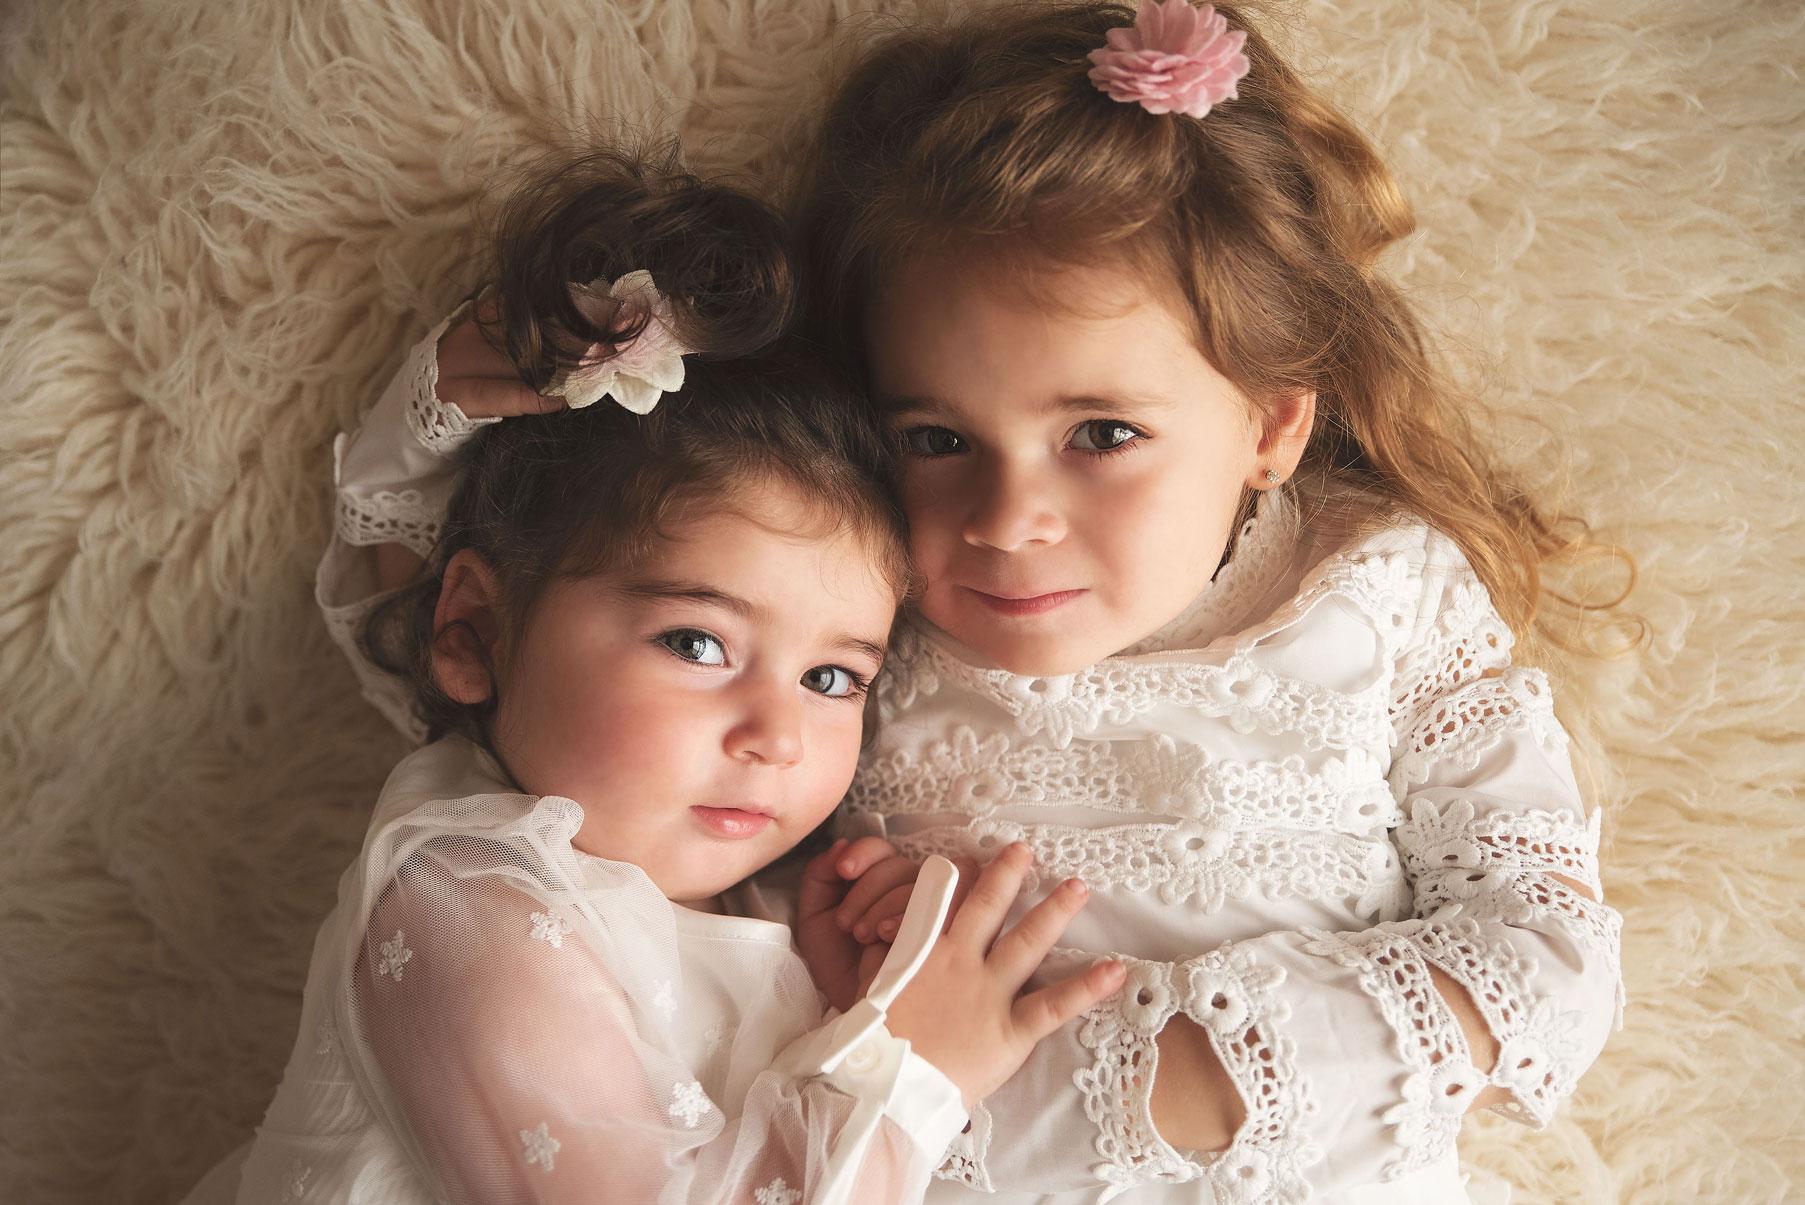 childrens-photography-sydney-baby-photographer-kids